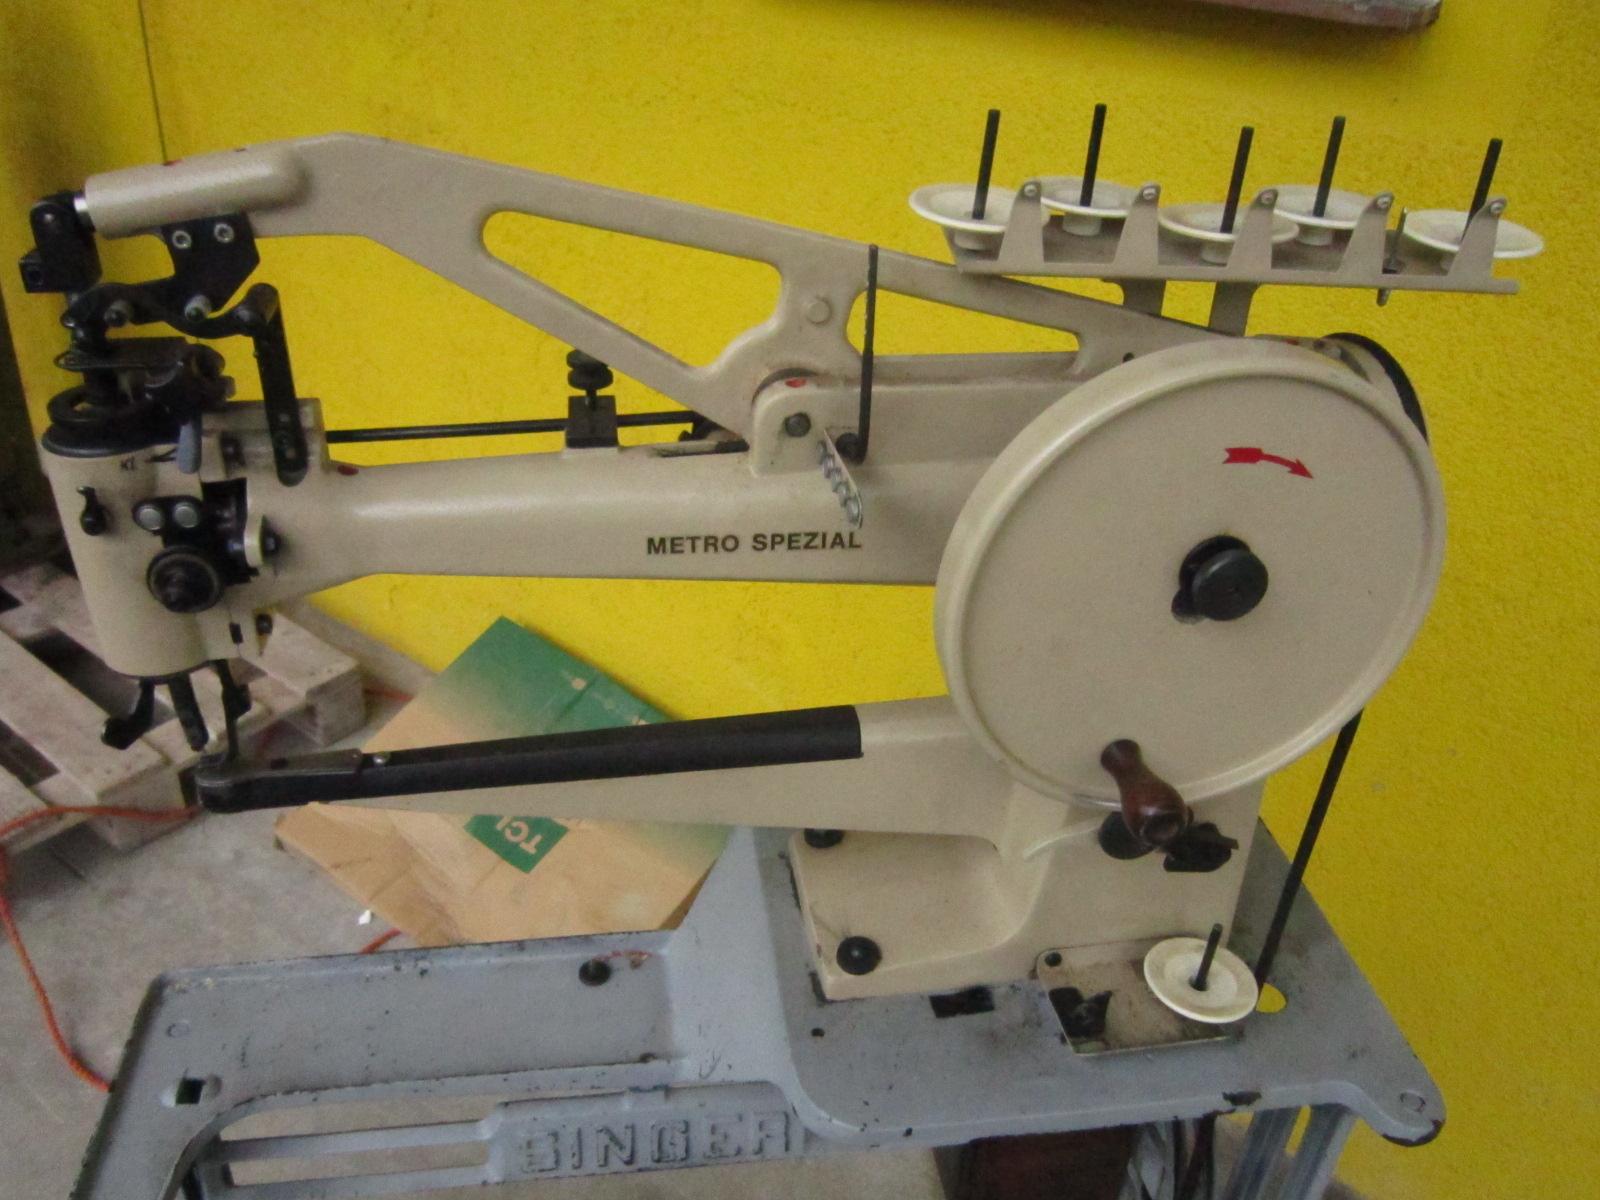 claes sewing machine